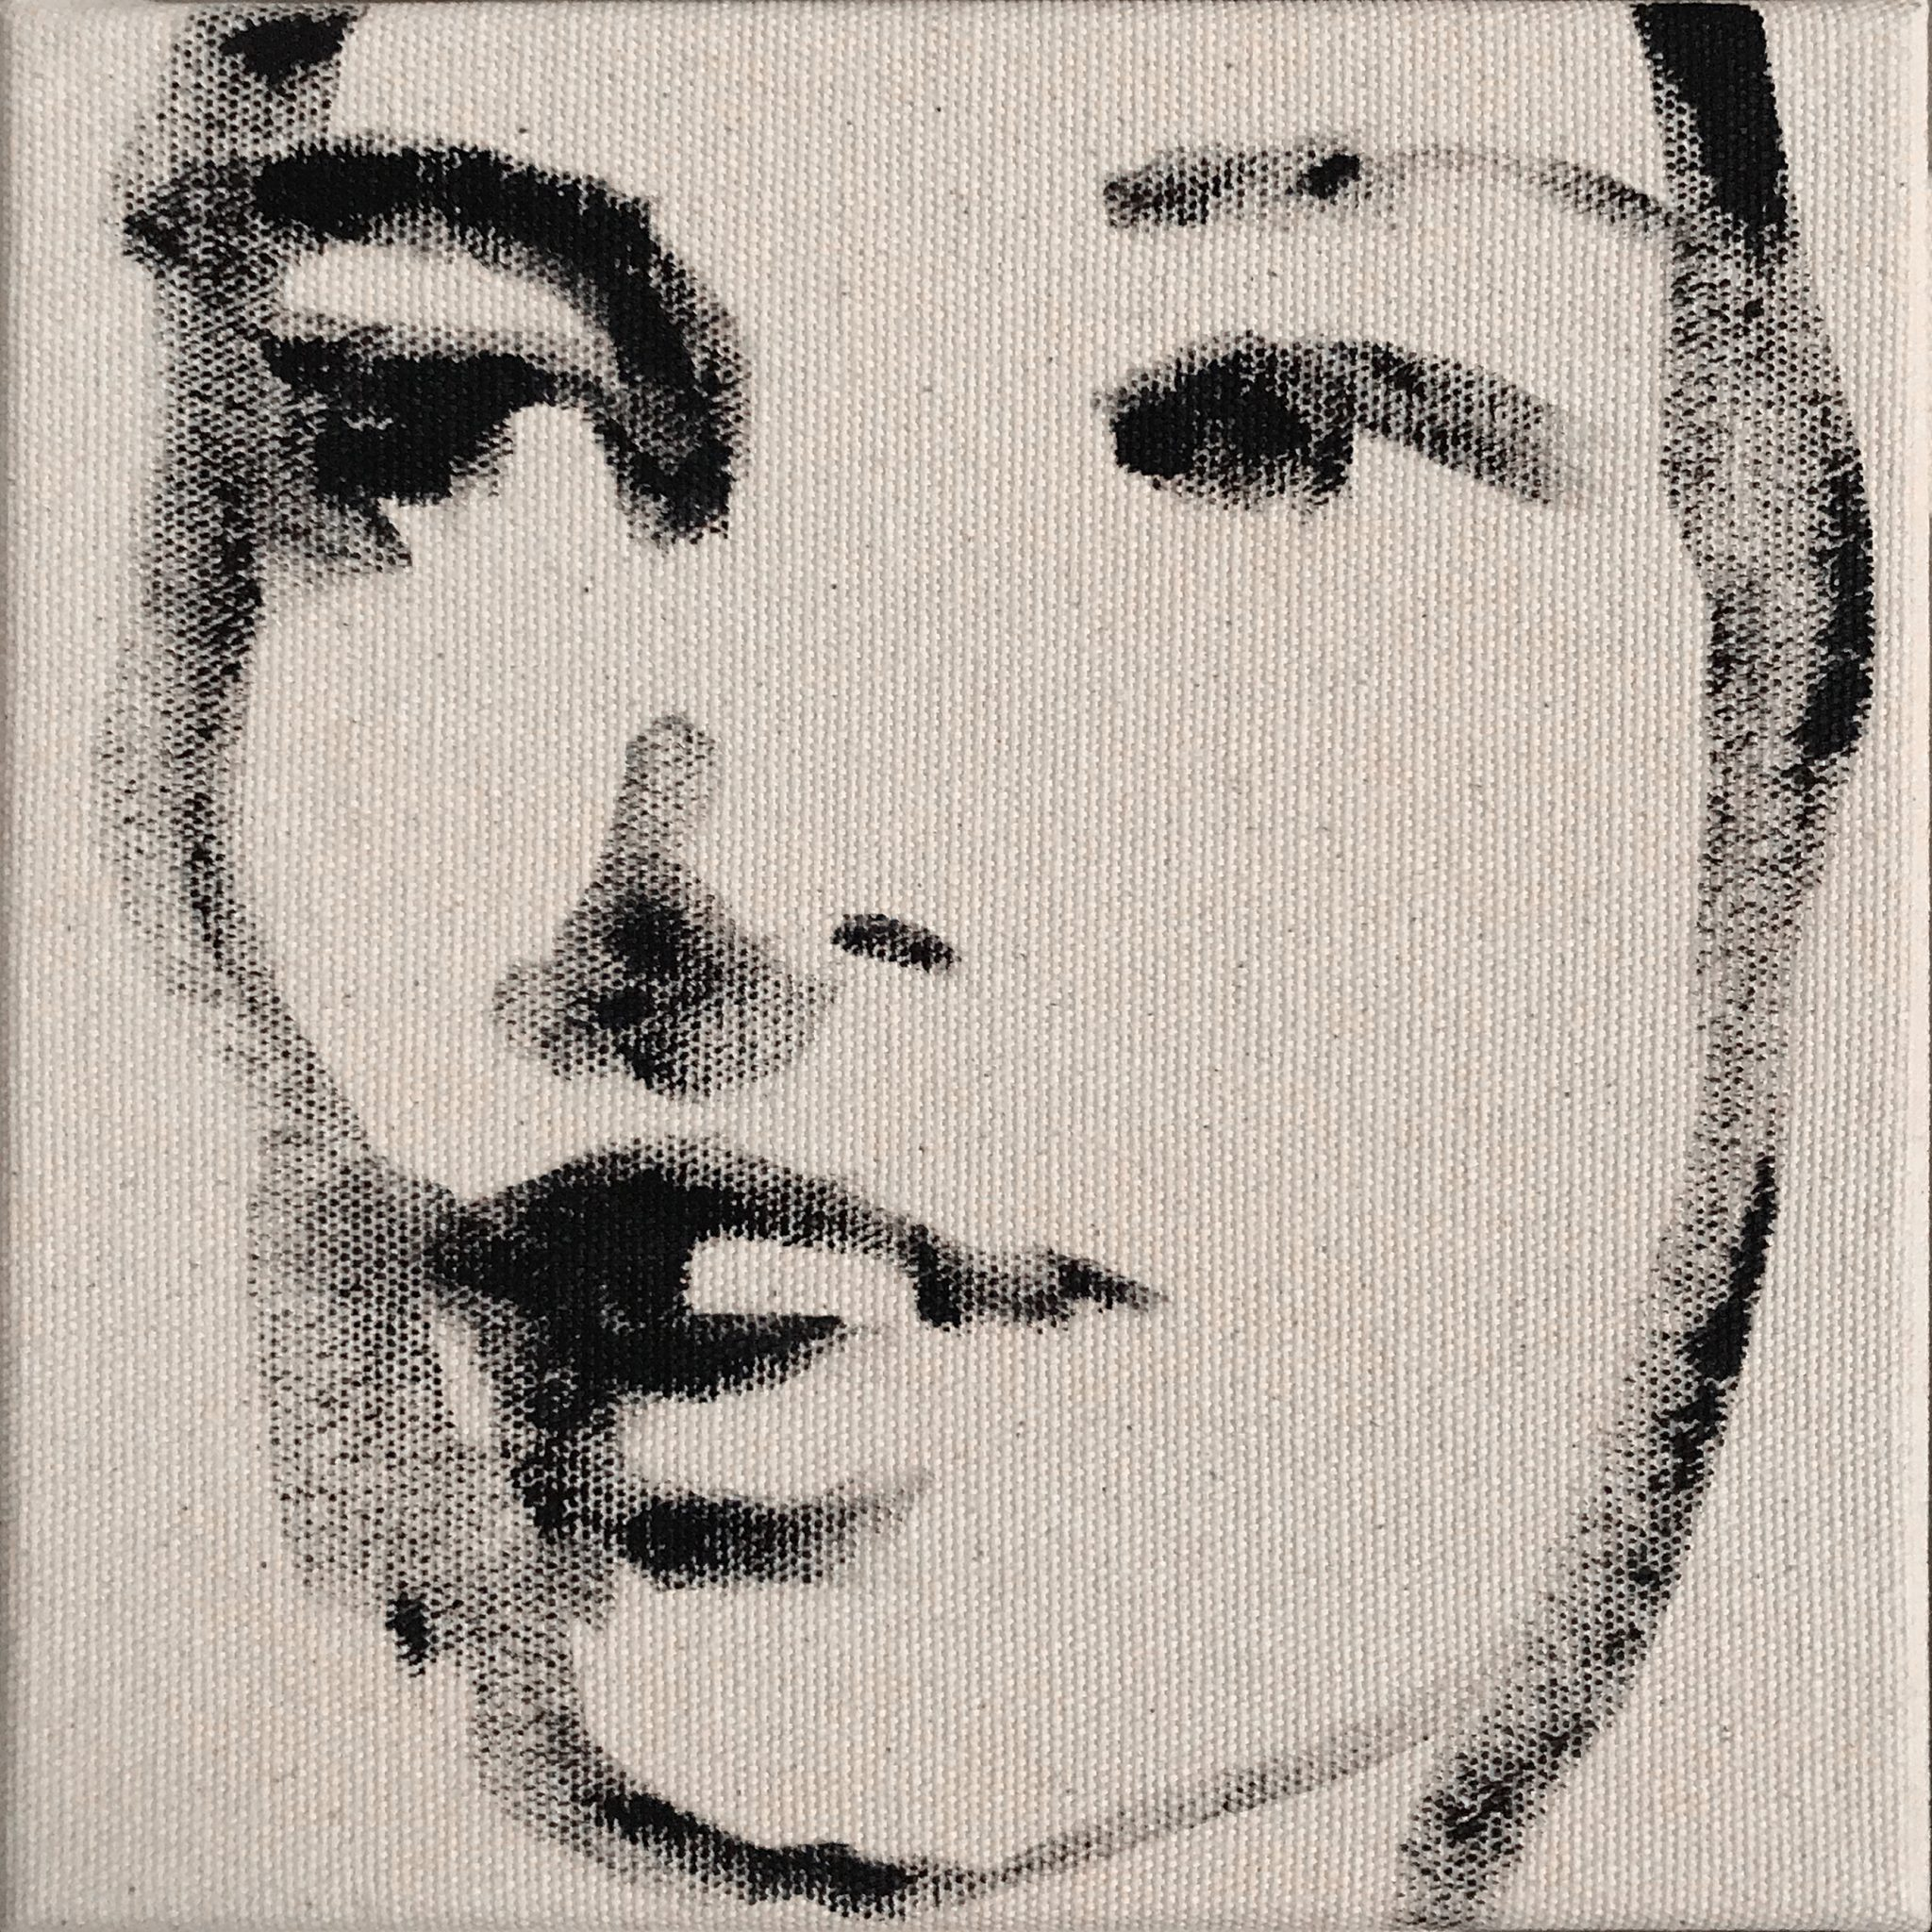 Brooke 15x15 cm acrylics on canvas